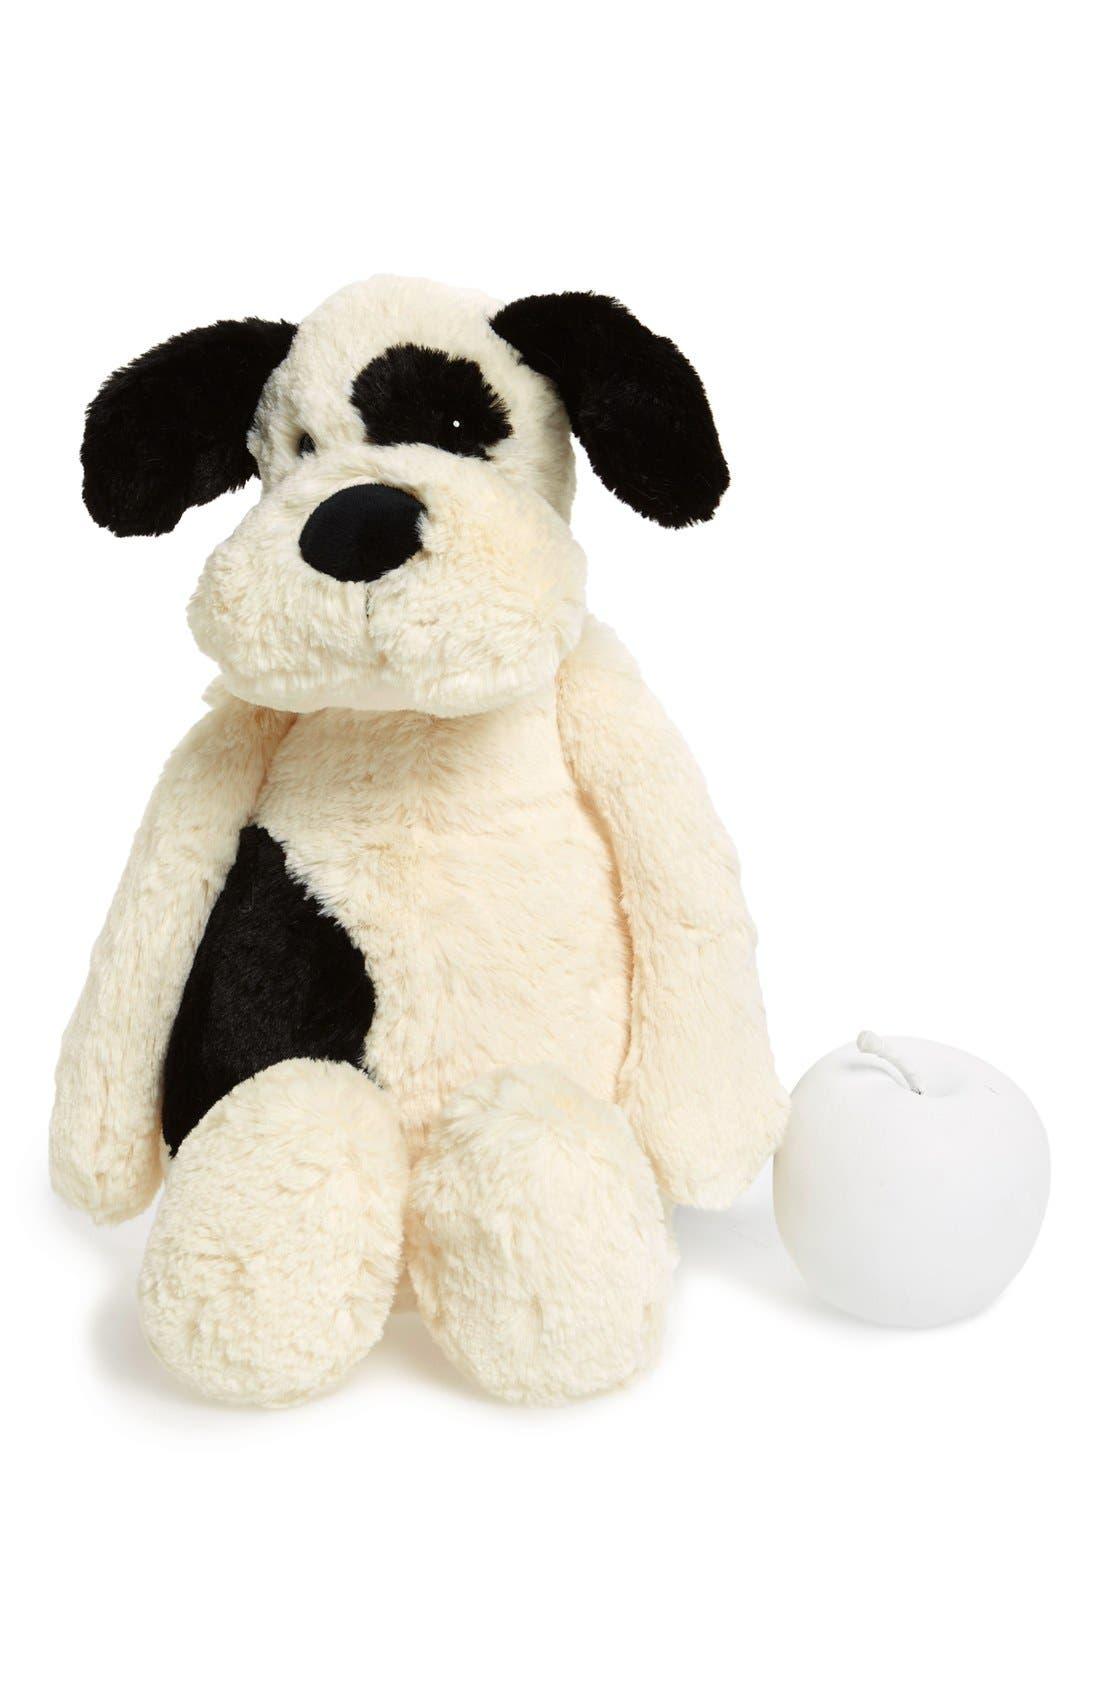 'Large Bashful Puppy' Stuffed Animal,                             Main thumbnail 1, color,                             IVORY